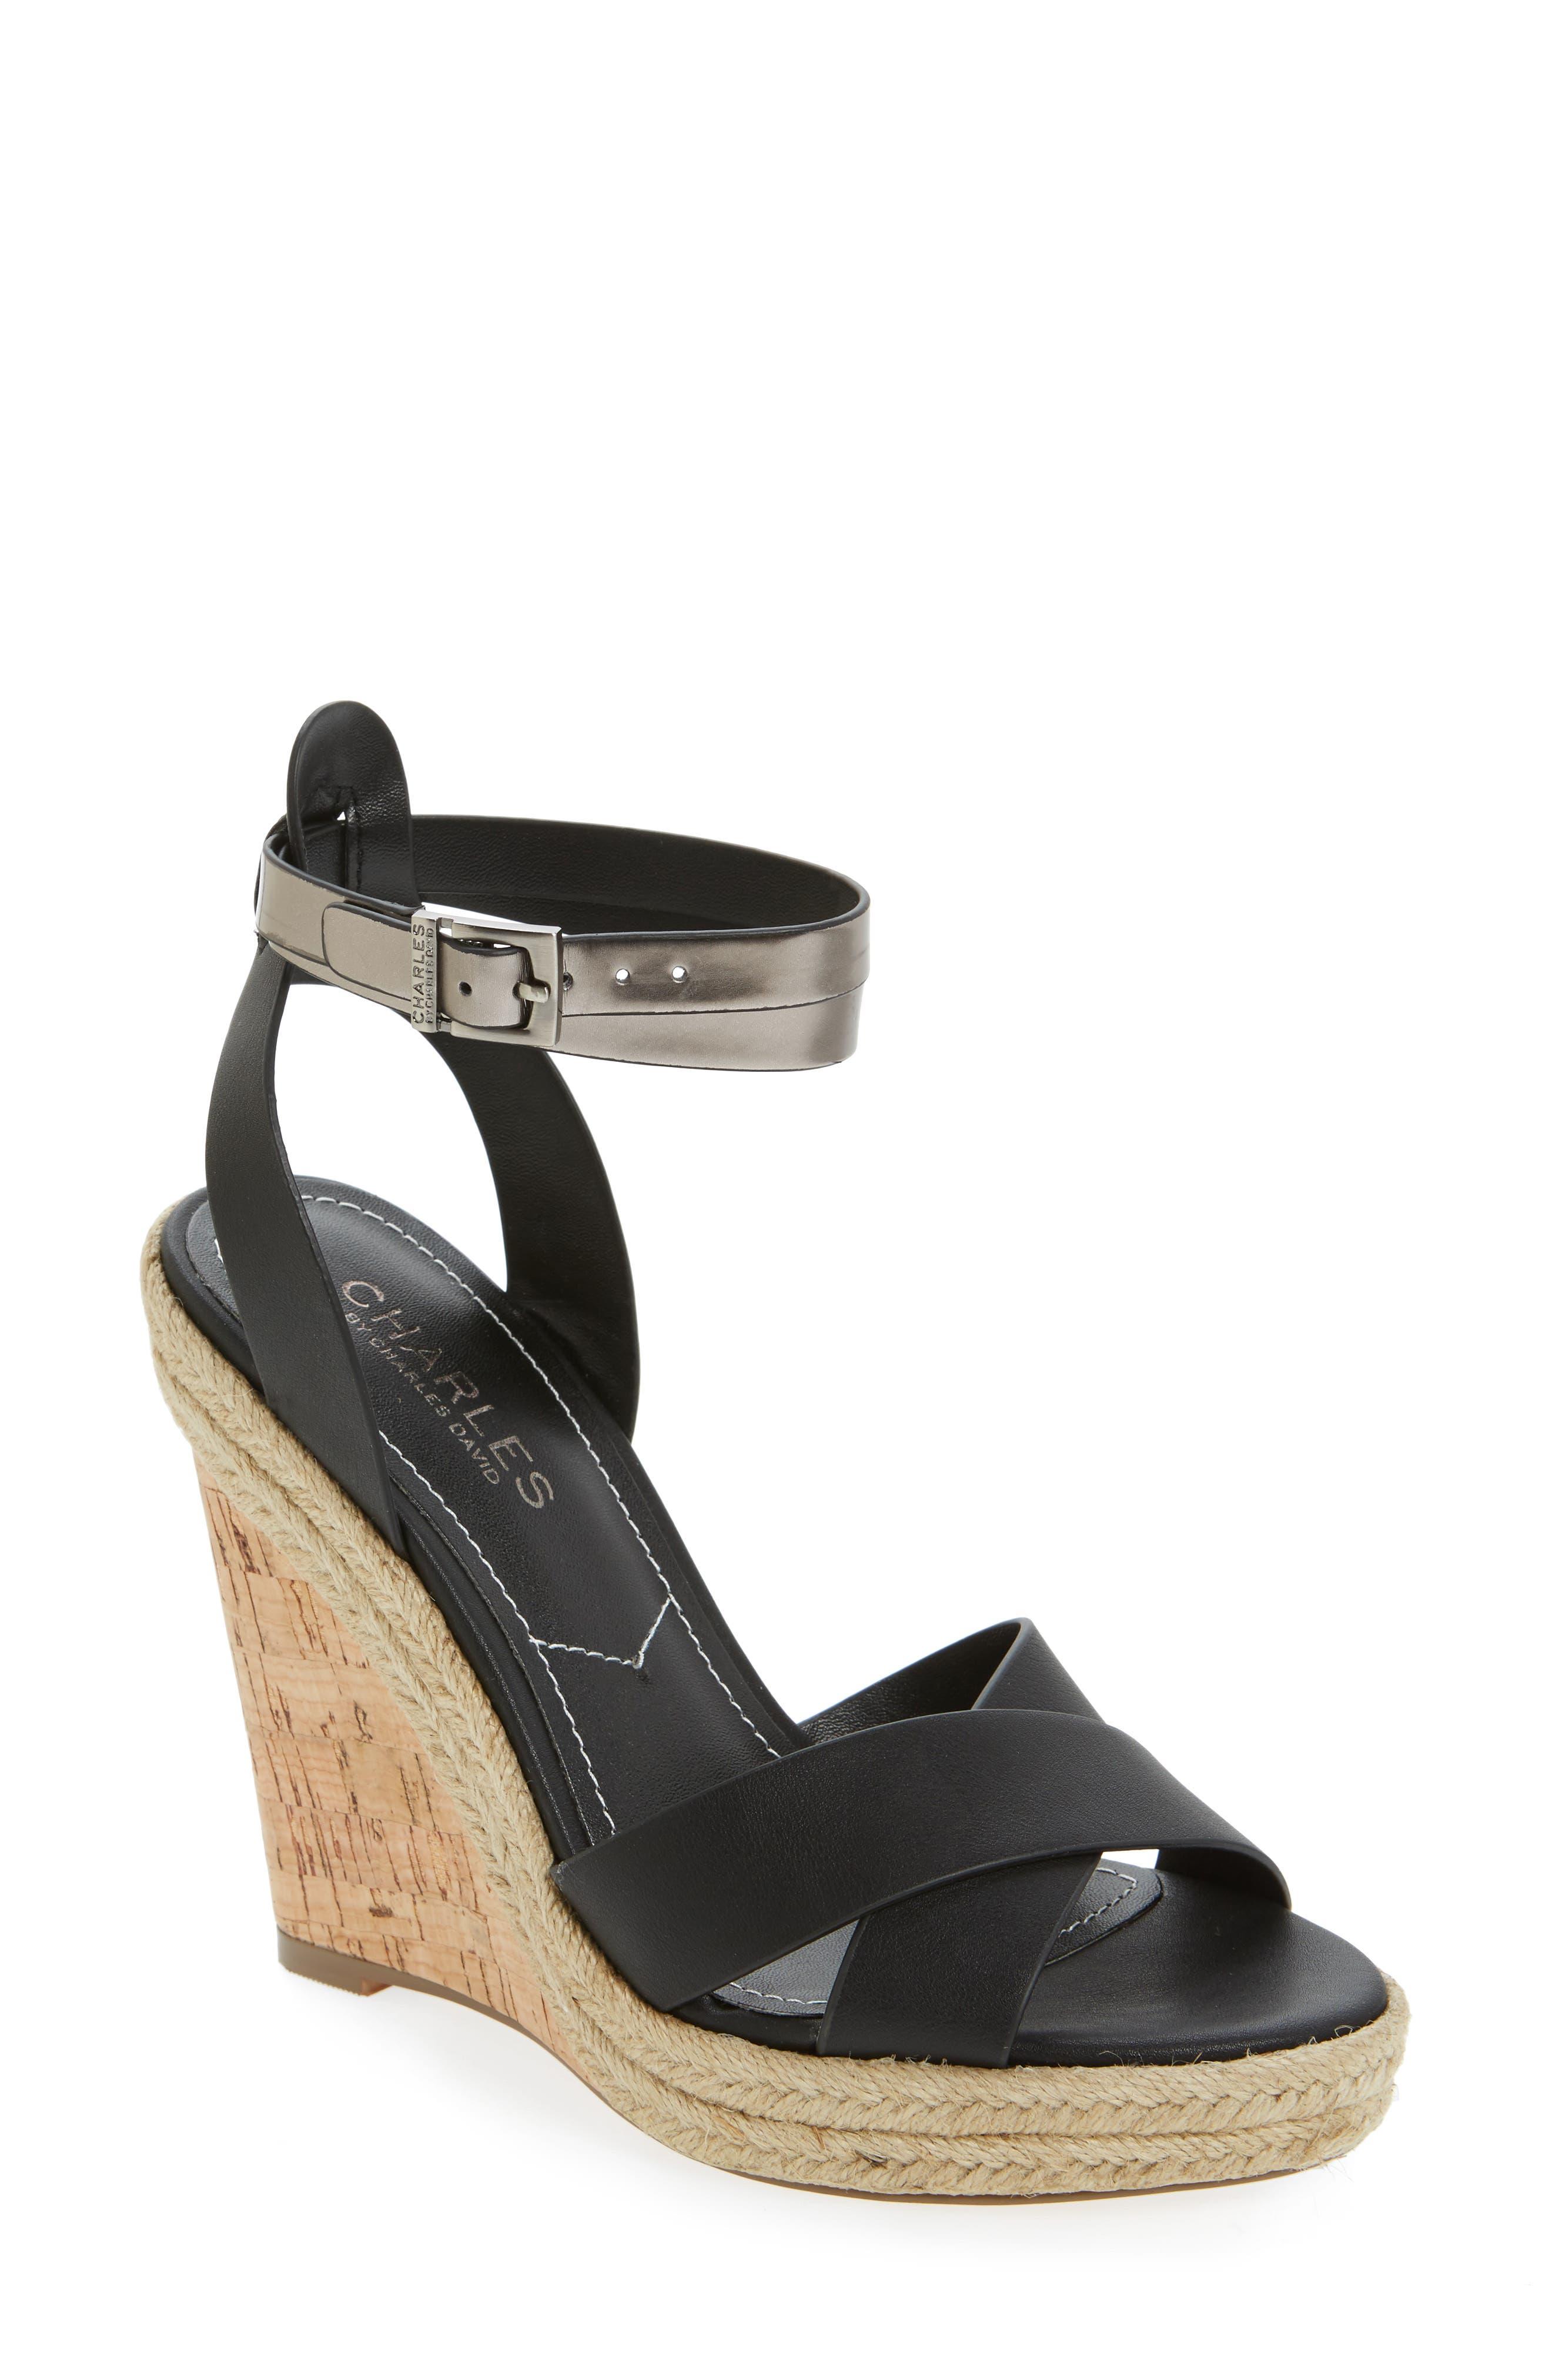 Brit Wedge Platform Sandal,                             Main thumbnail 1, color,                             Black/ Gunmetal